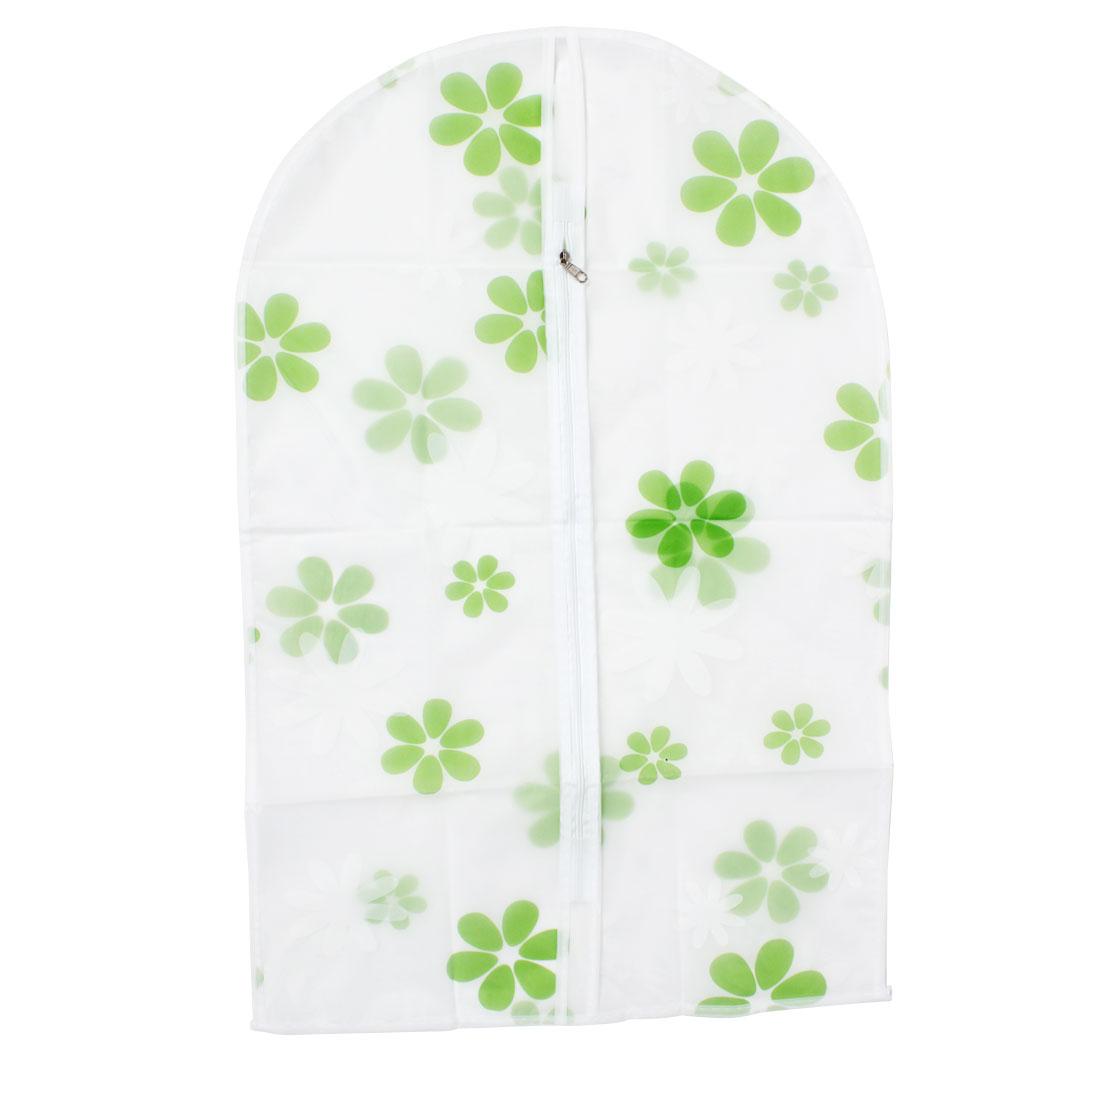 "Clothes Suit Dress PEVA Flower Pattern Zip Up Dustproof Cover Bag 27"" Length"